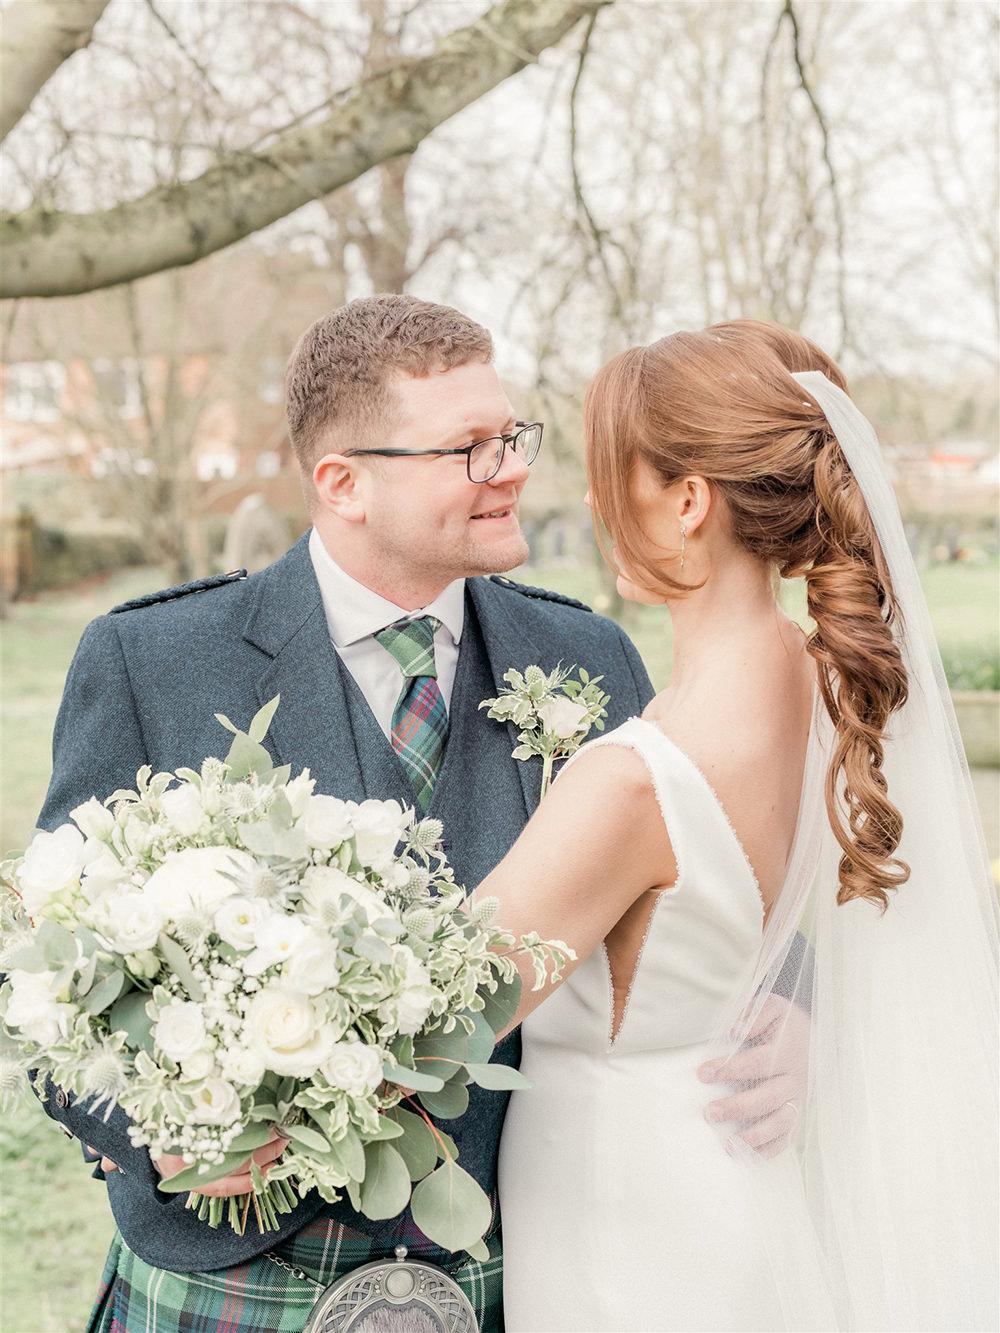 Bride Bridal Hair Style Up Do Pony Tail Veil Lockdown Wedding Carn Patrick Photography